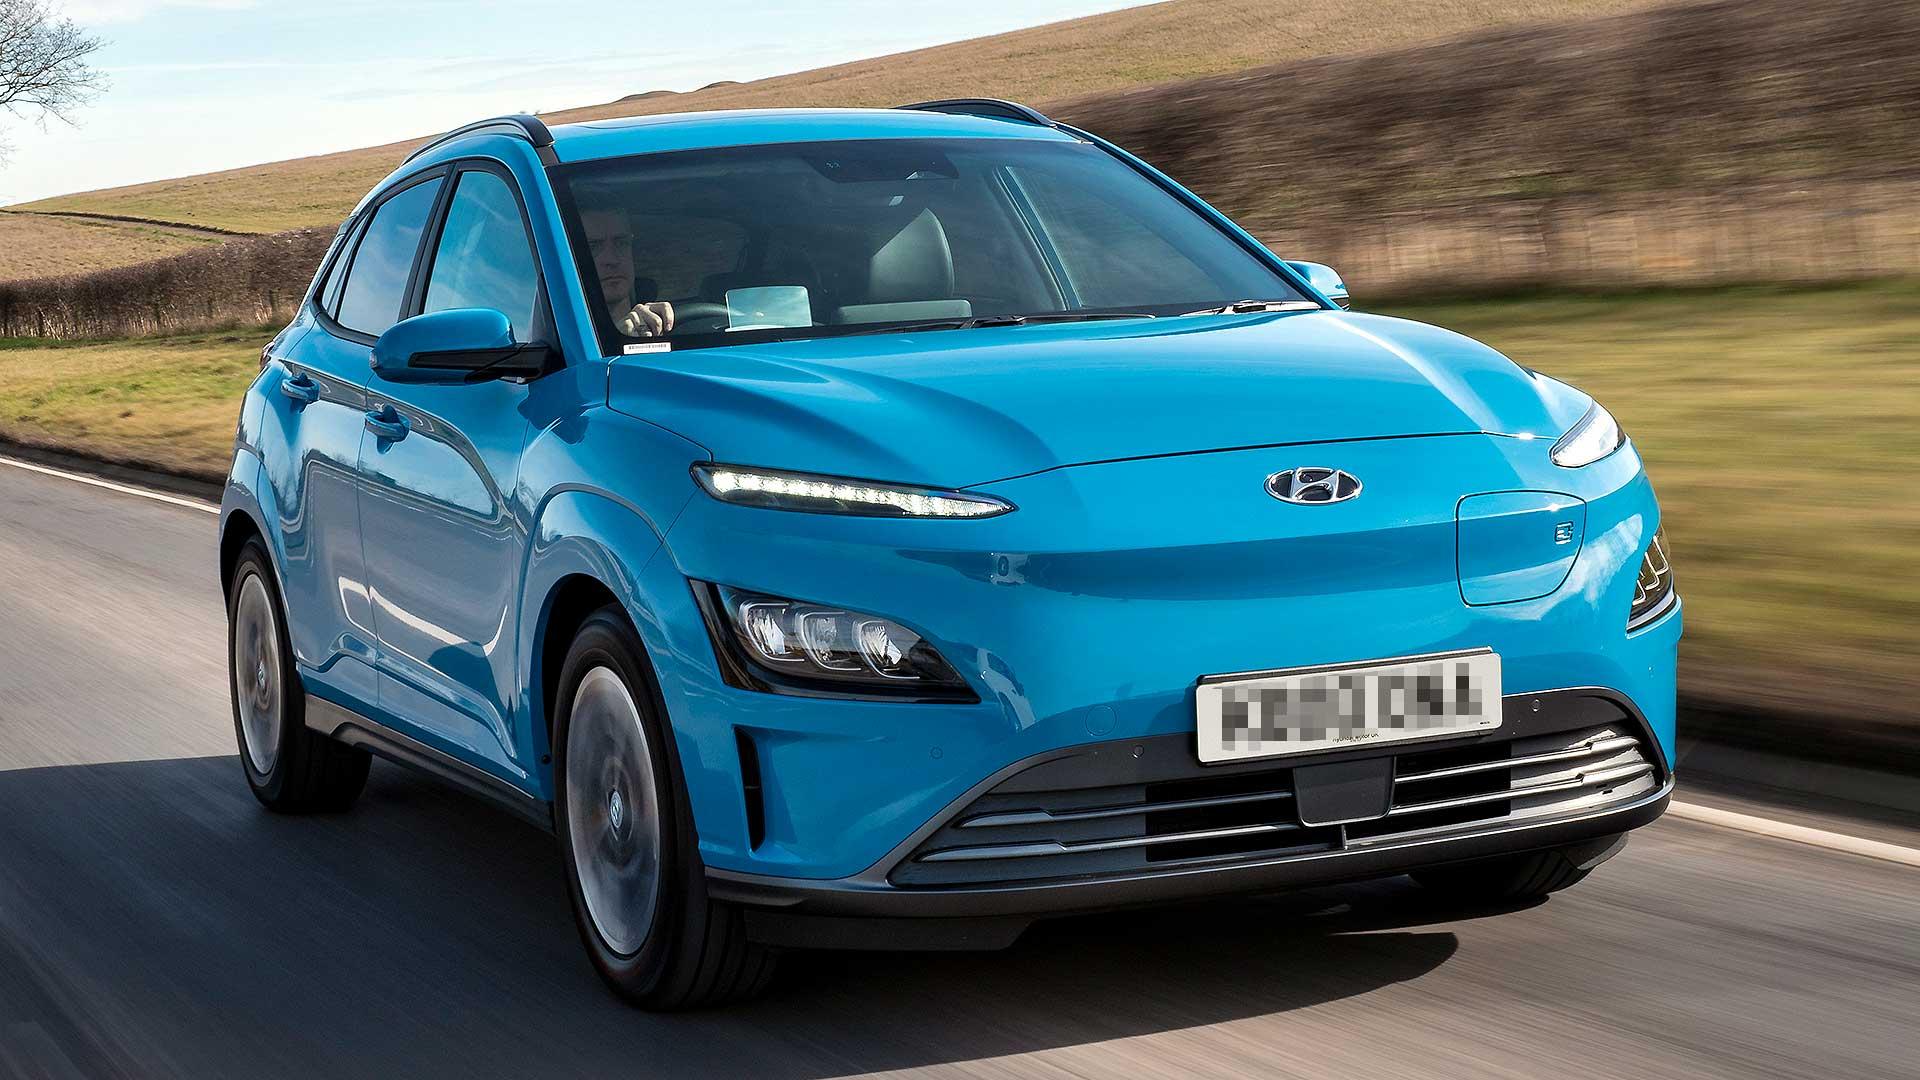 2021 electric car hyundai